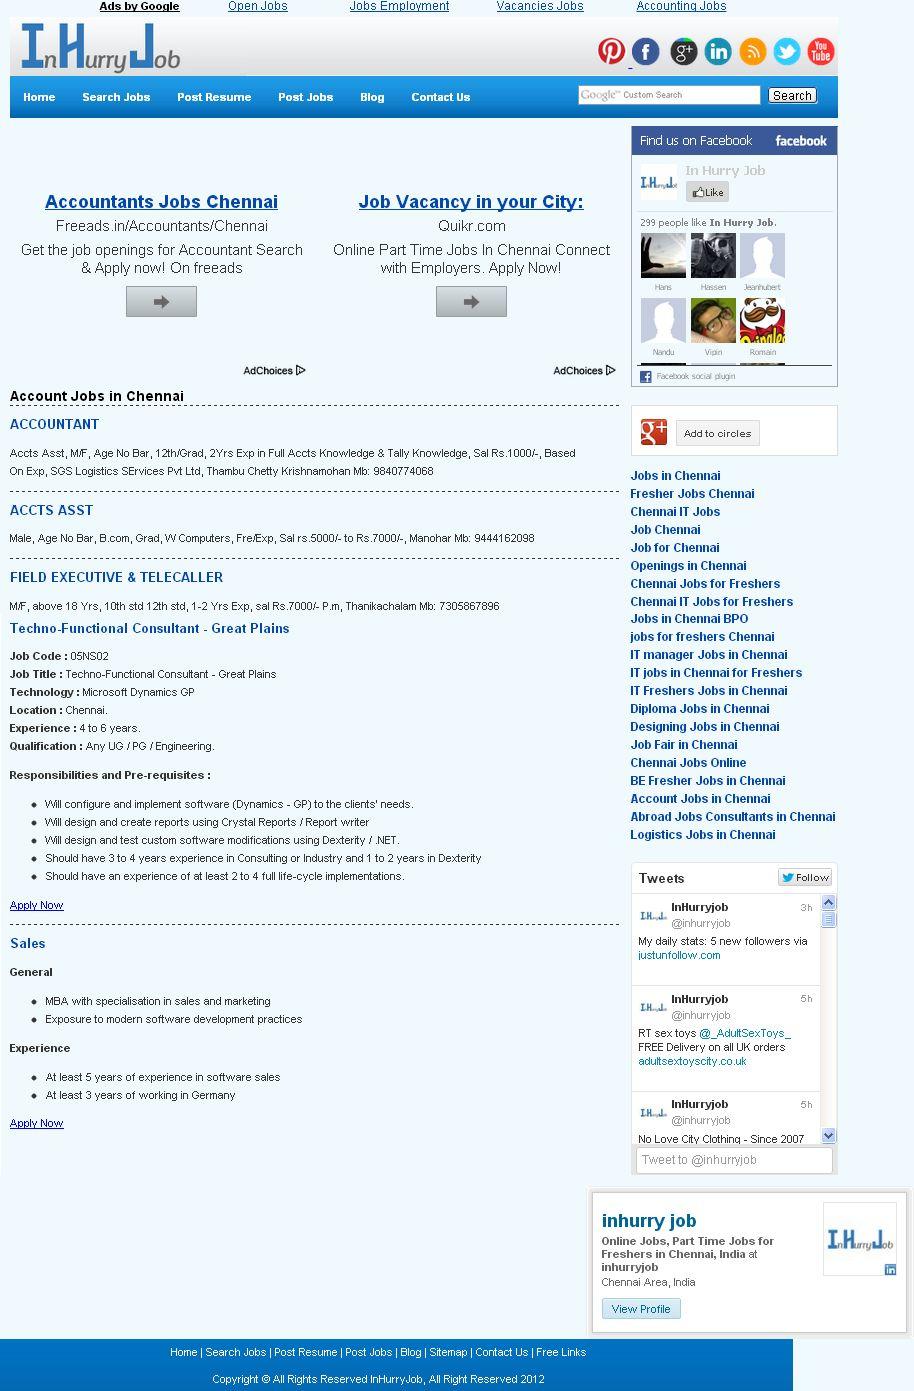 Pin by inhurryjob on inhurryjob Accounting jobs, Job